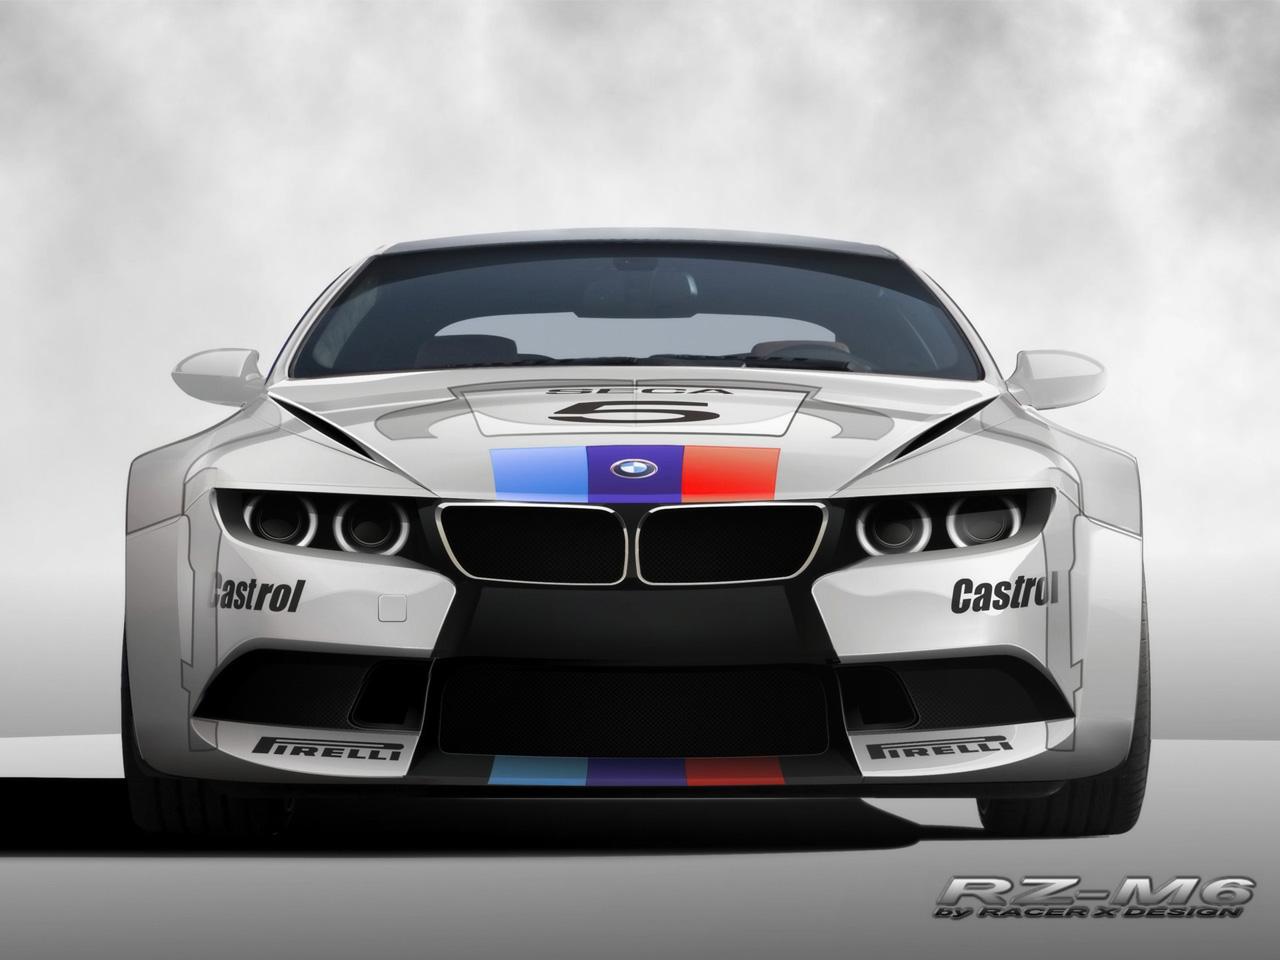 bmw sports car wallpaper hd bmw car wallpaper hd bmw 1280x960